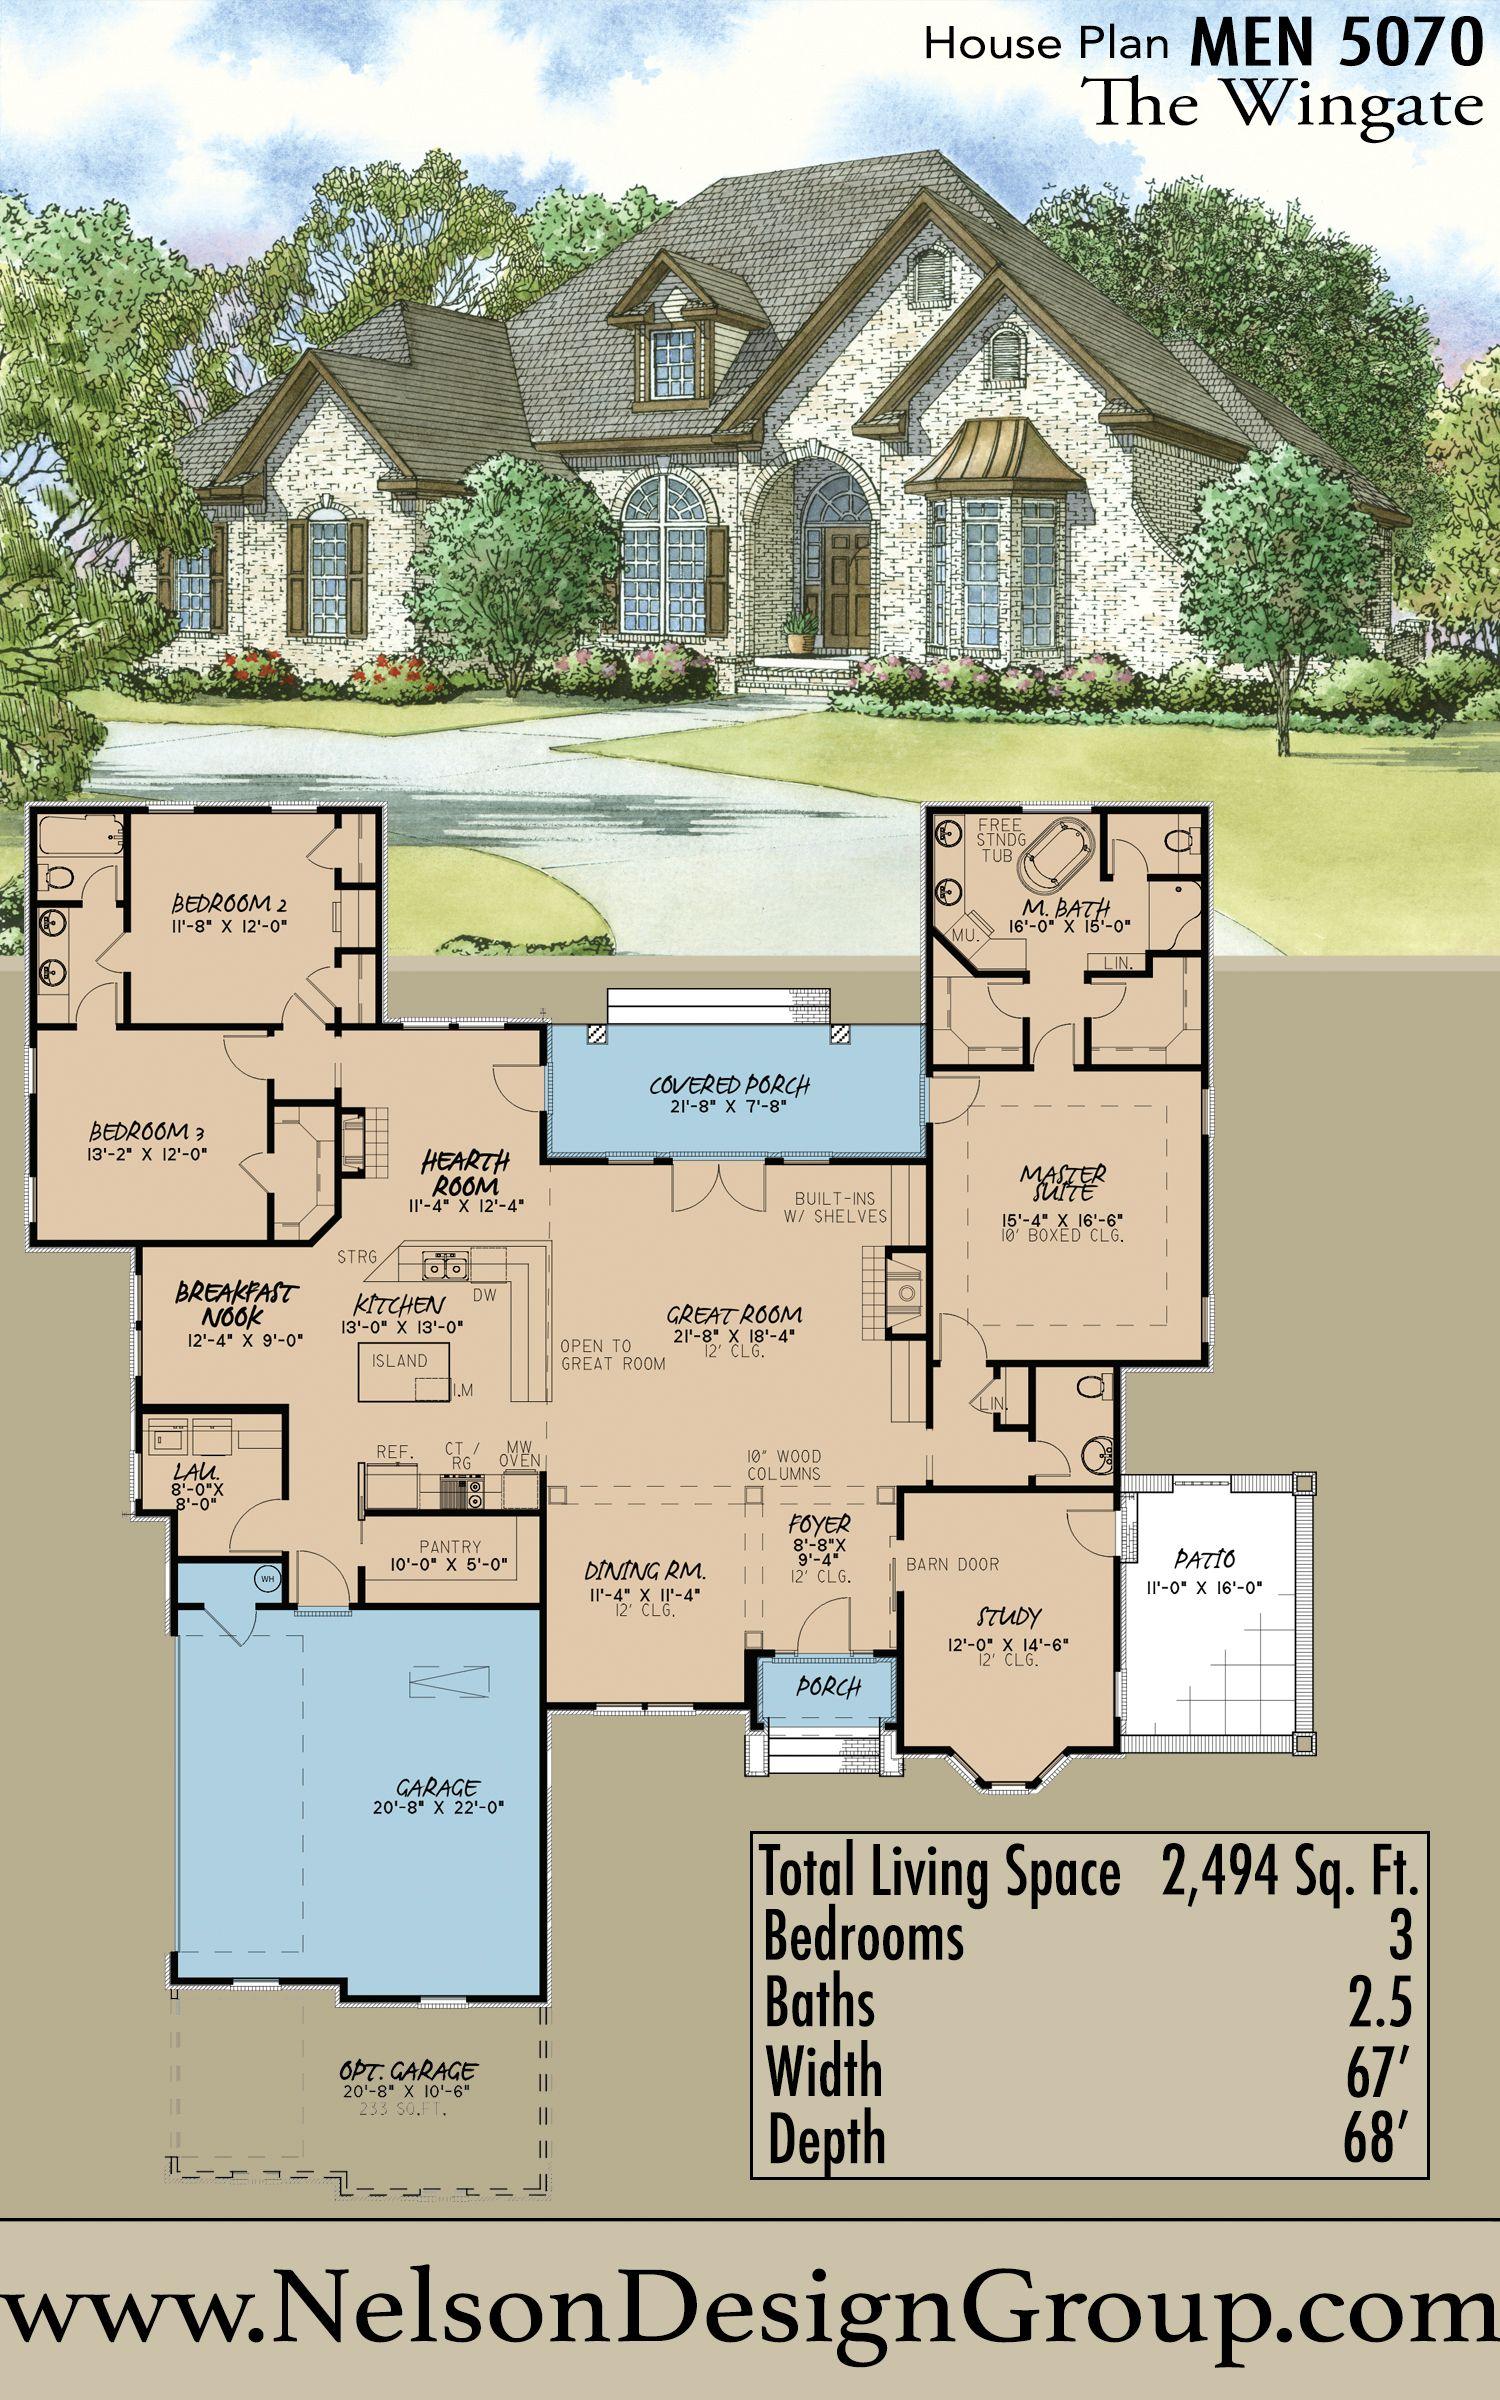 houseplan houseplans homeplan homeplans house houses home